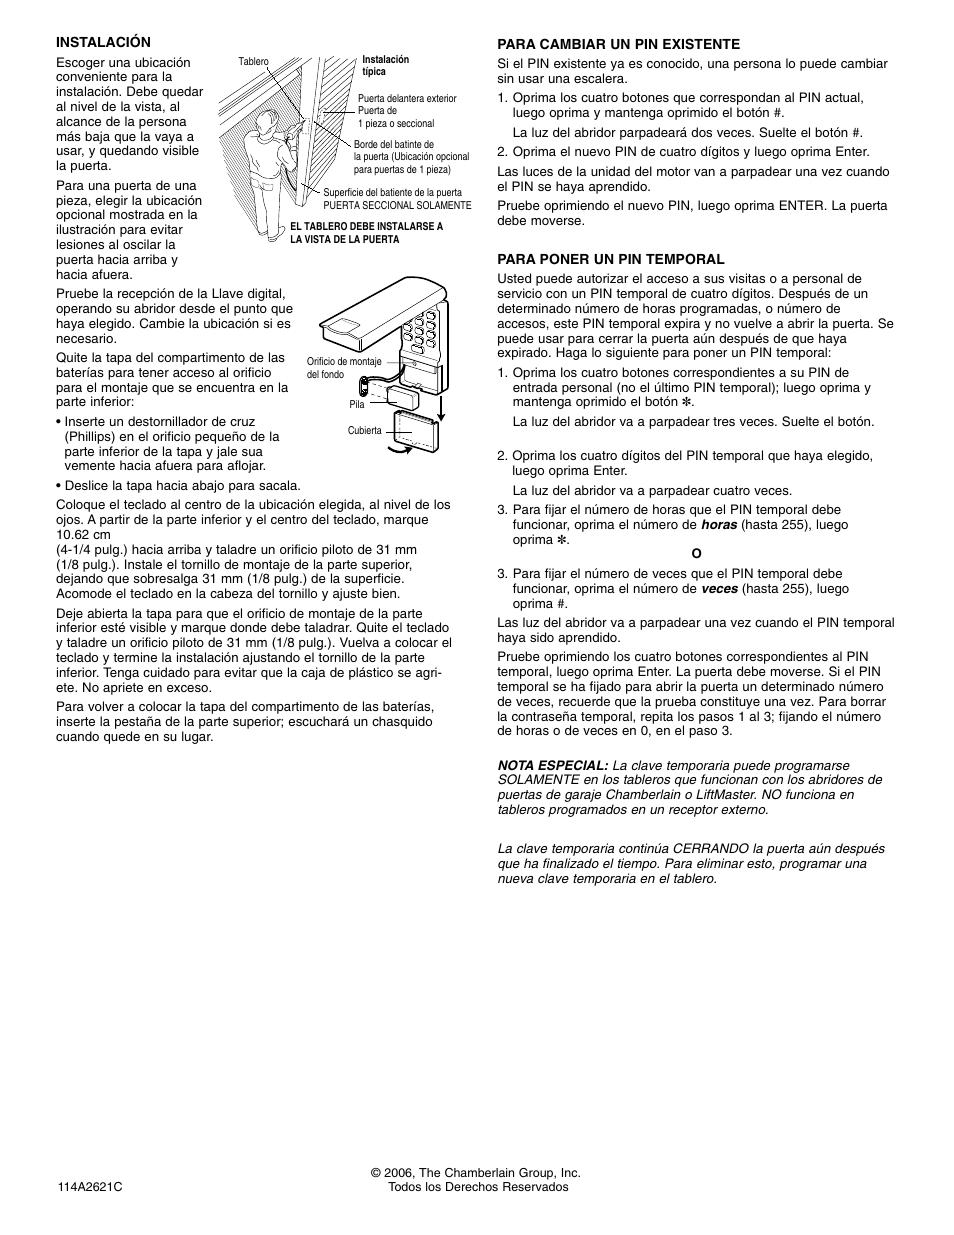 Instalación   Chamberlain SECURITY 940-315CB User Manual   Page 4 / 4